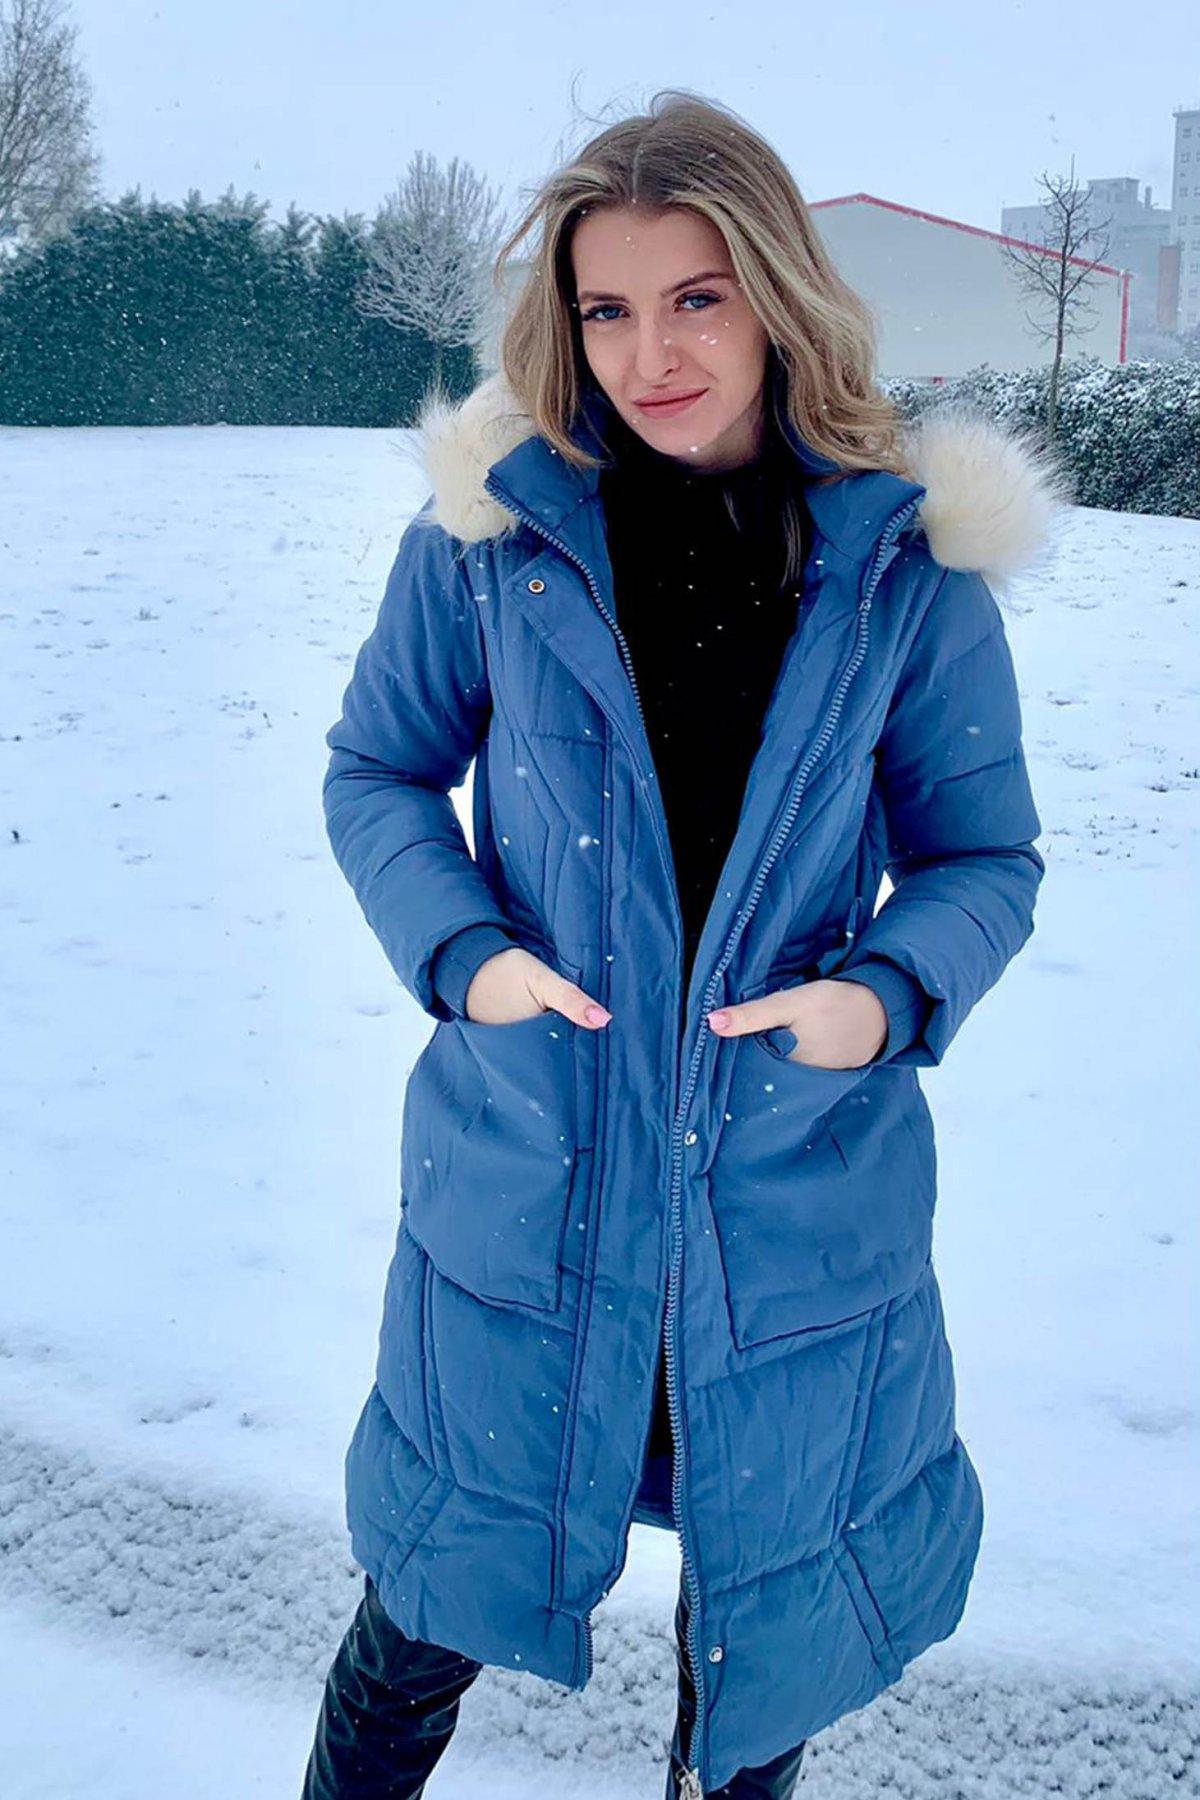 Geaca SunShine albastra casual lunga din fas cu gluga detasabila accesorizata cu blana ecologica